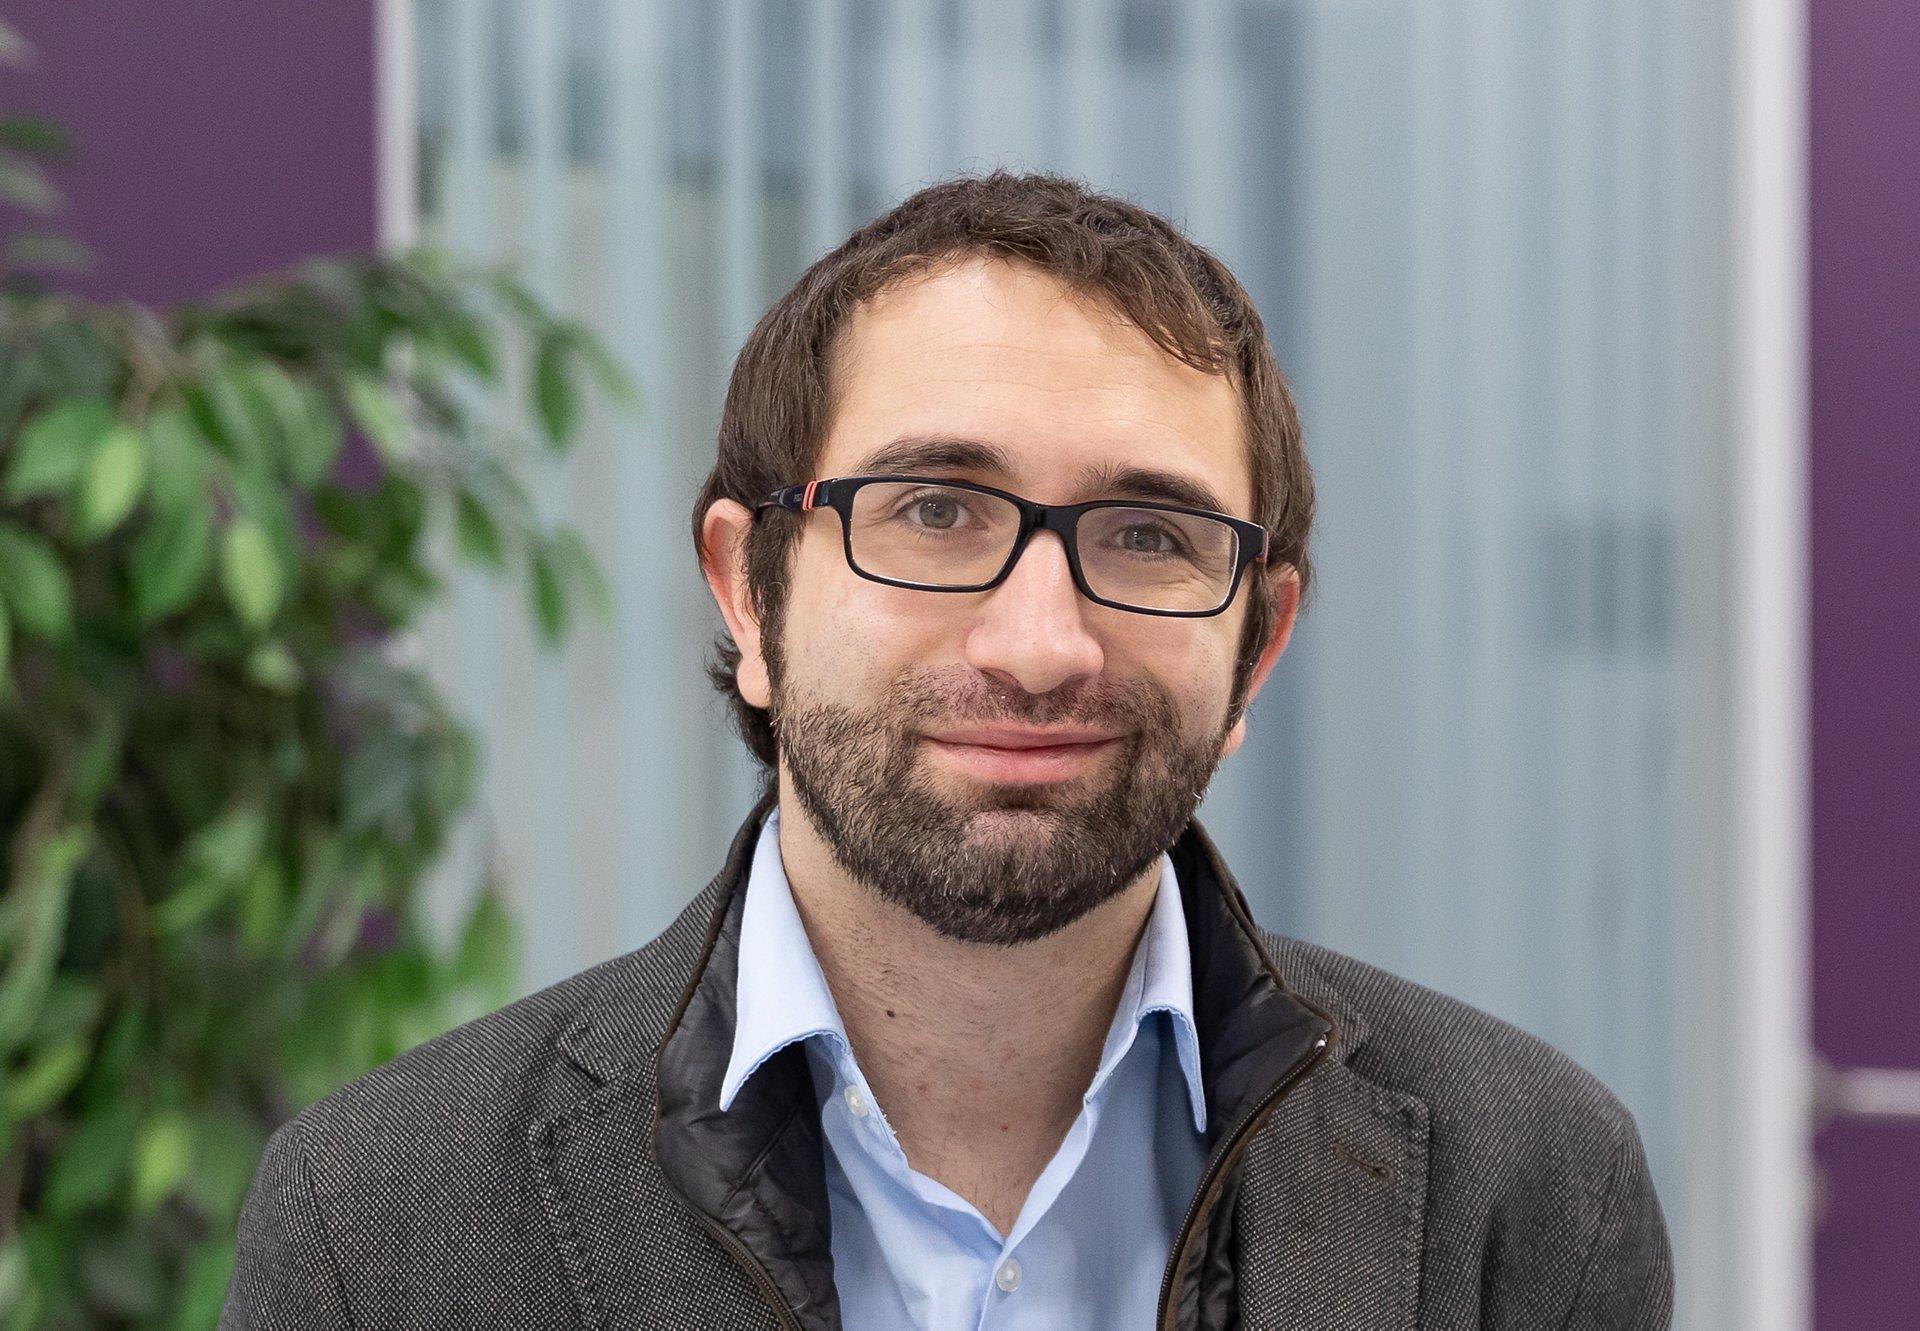 Portrait of Alvaro, Head of Protospace project in Madrid.